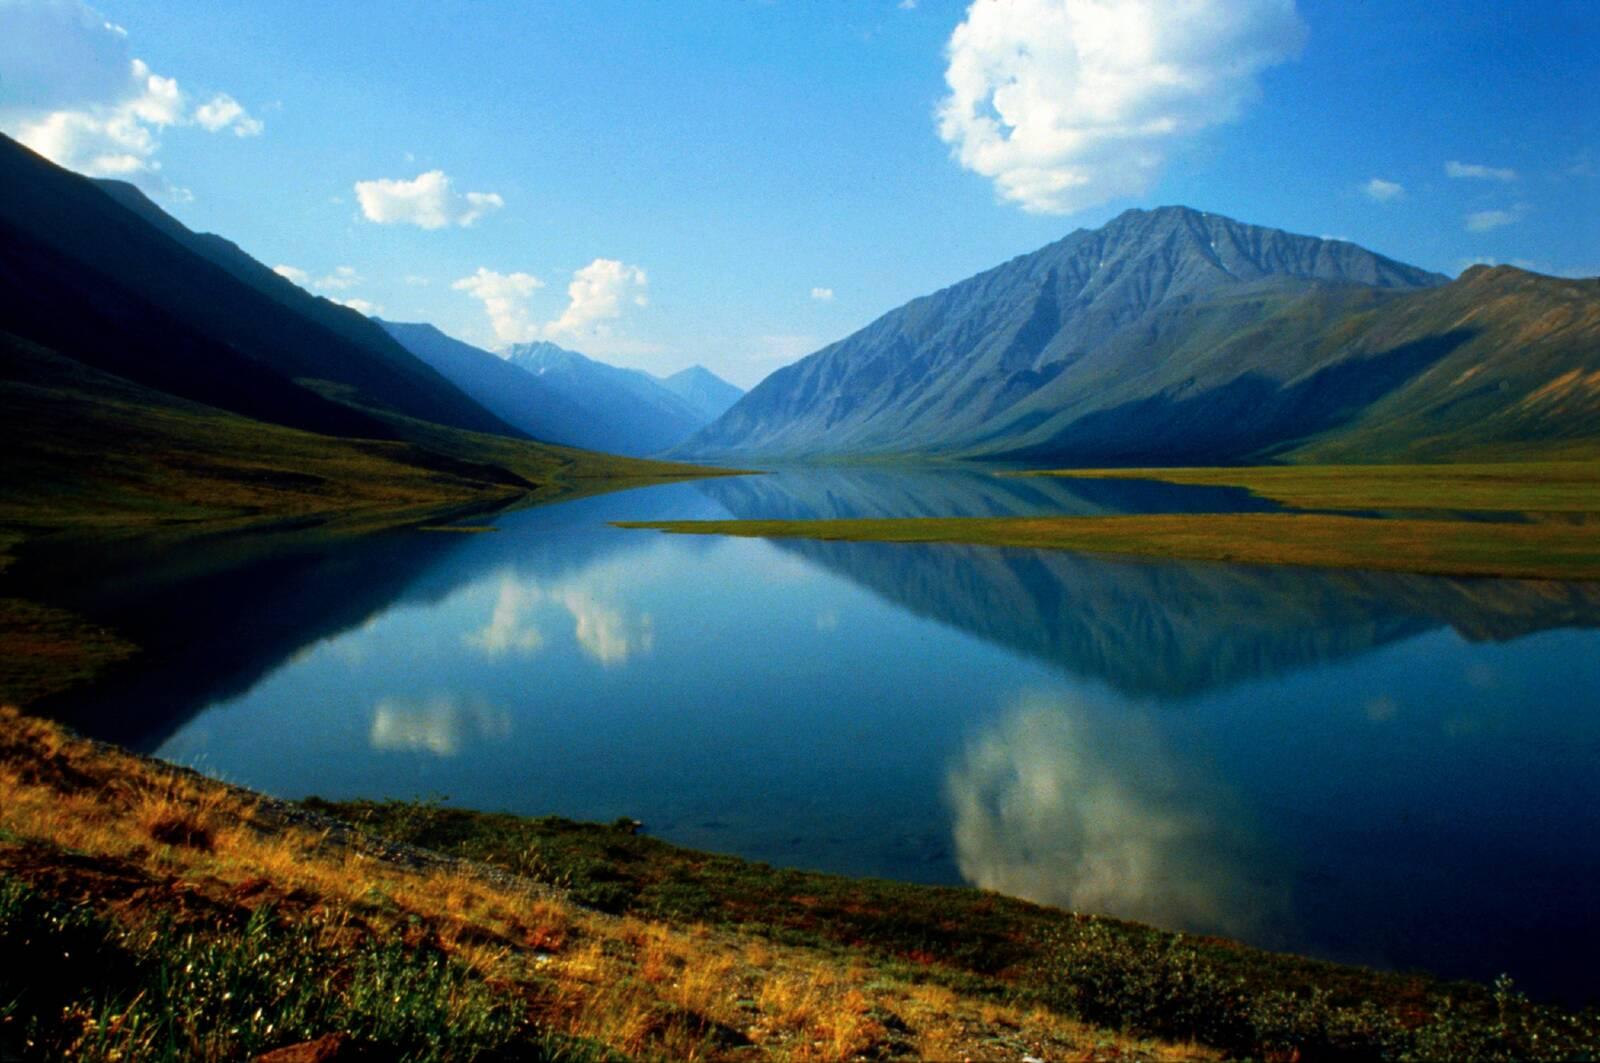 Arctic National Wildlife Refuge in Alaska. Credit: Universal Images Group via Getty Images